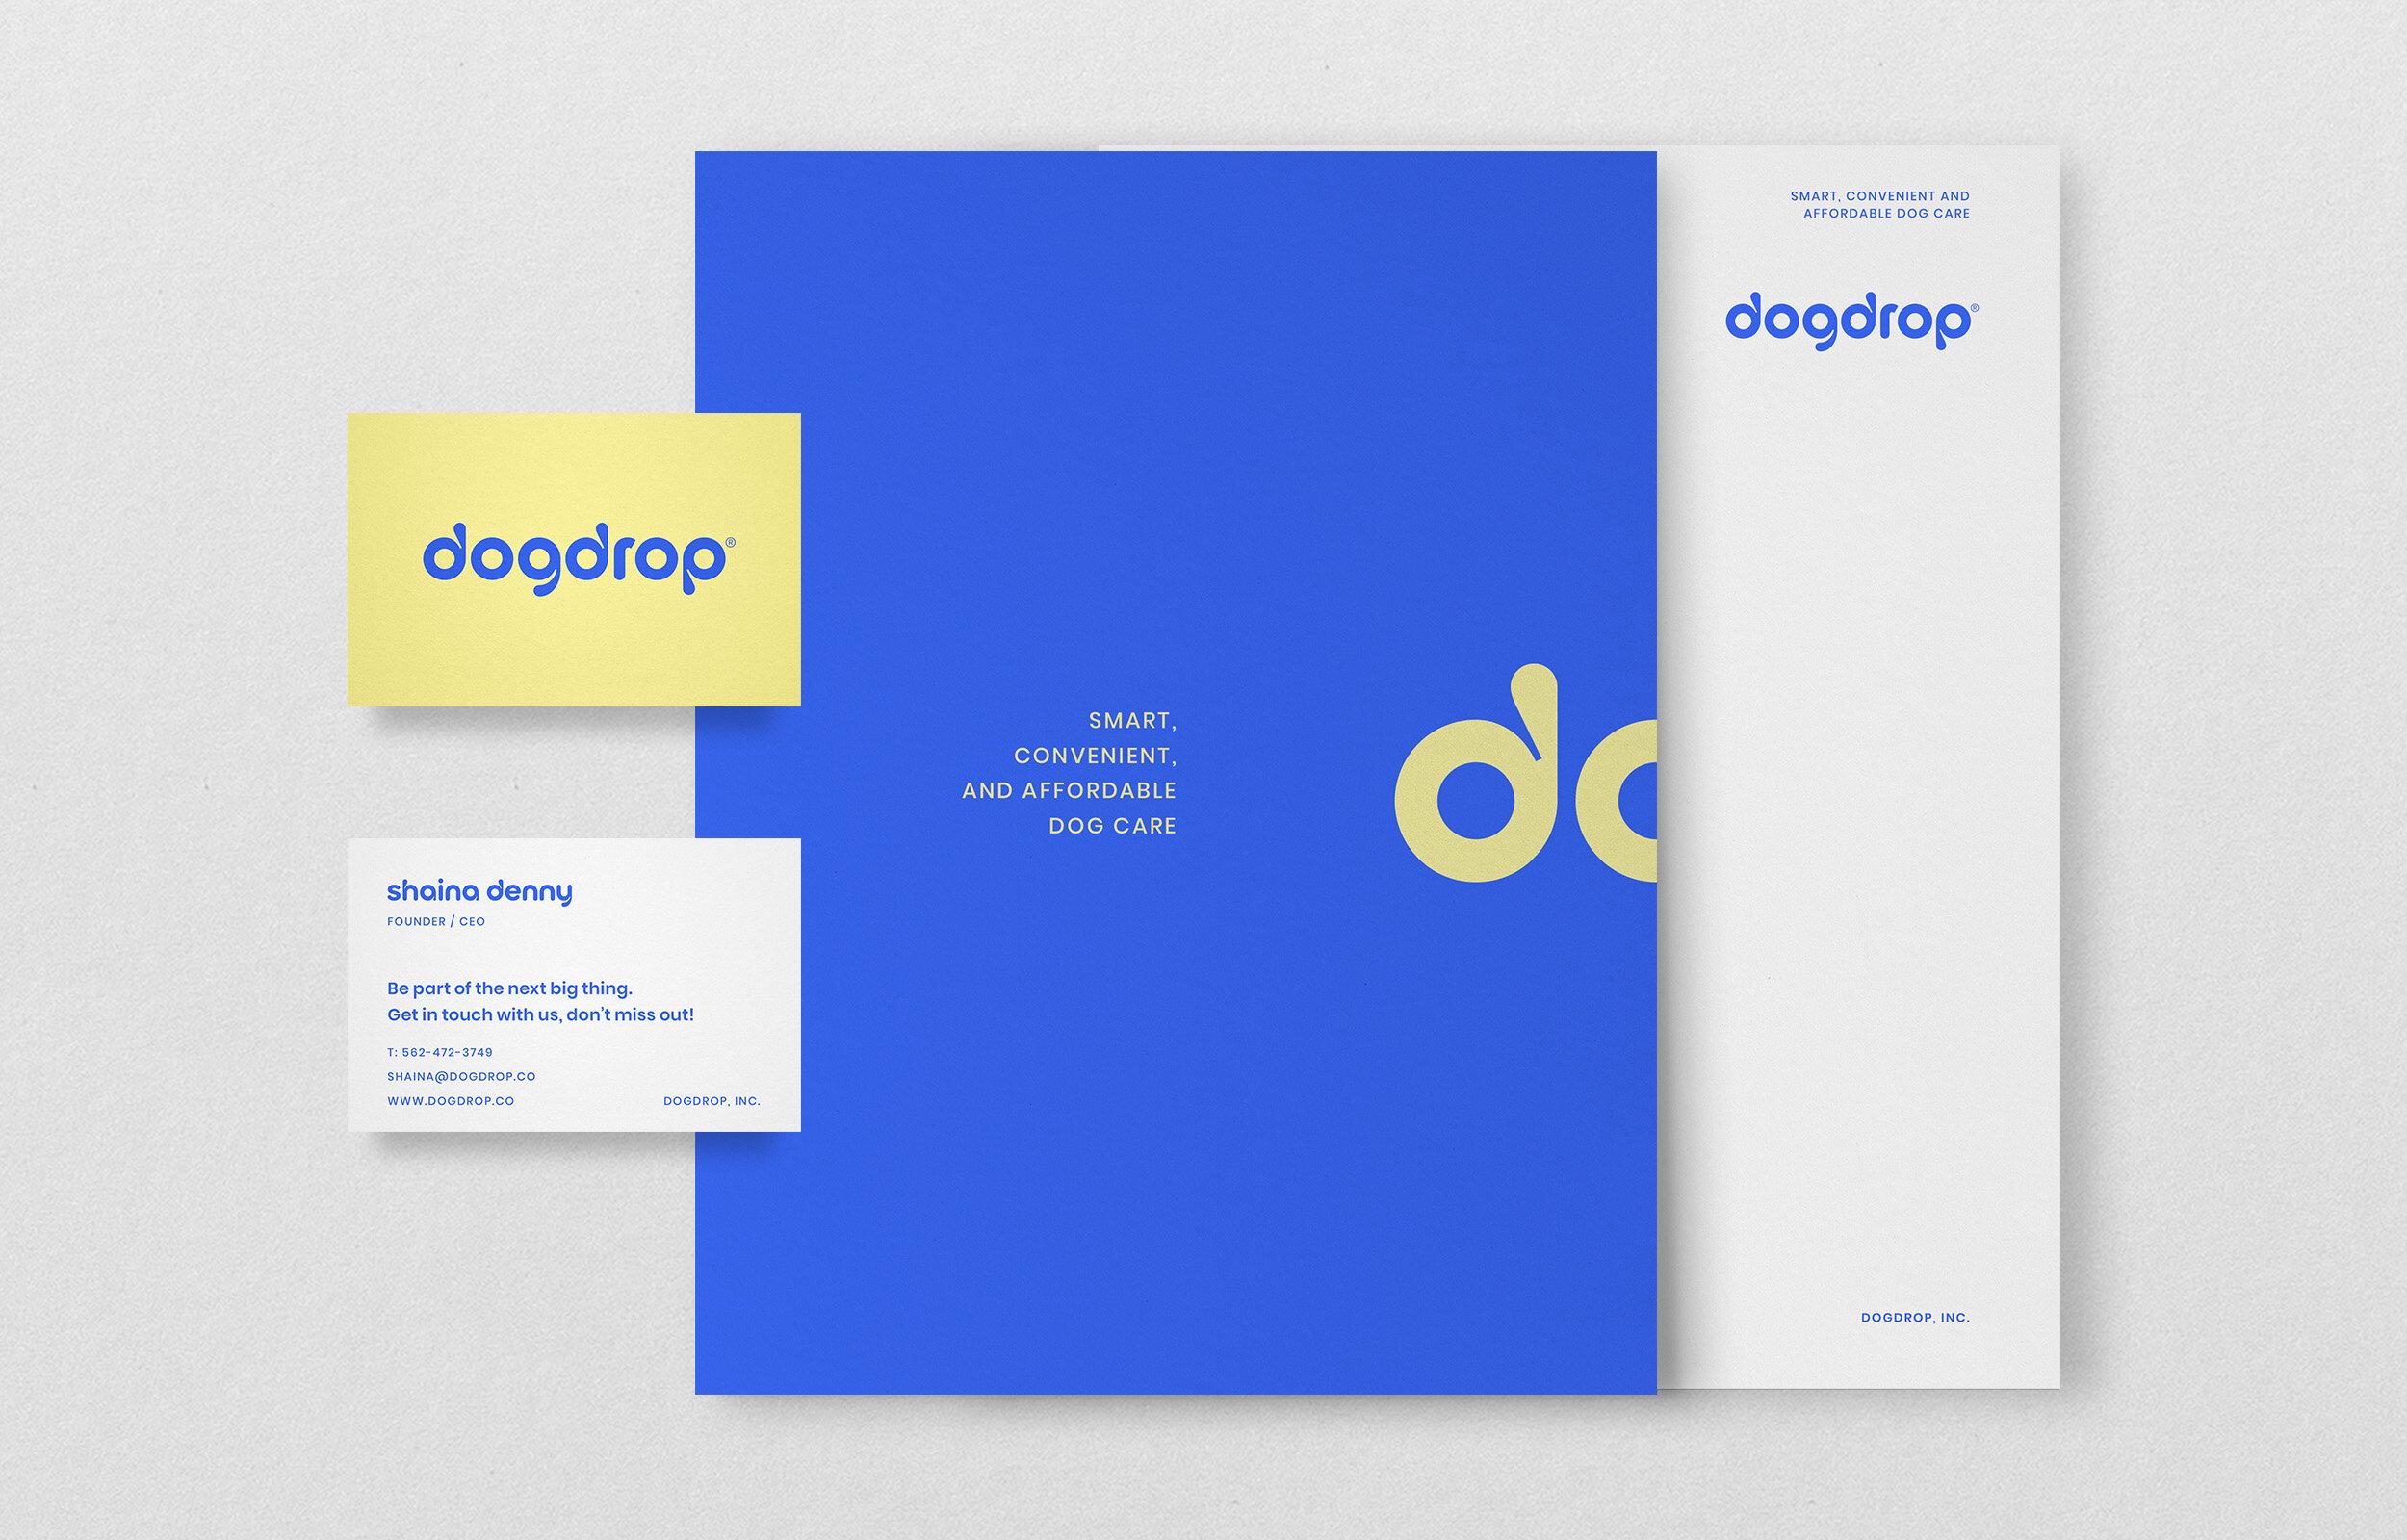 Sample_Tipografico2.jpg